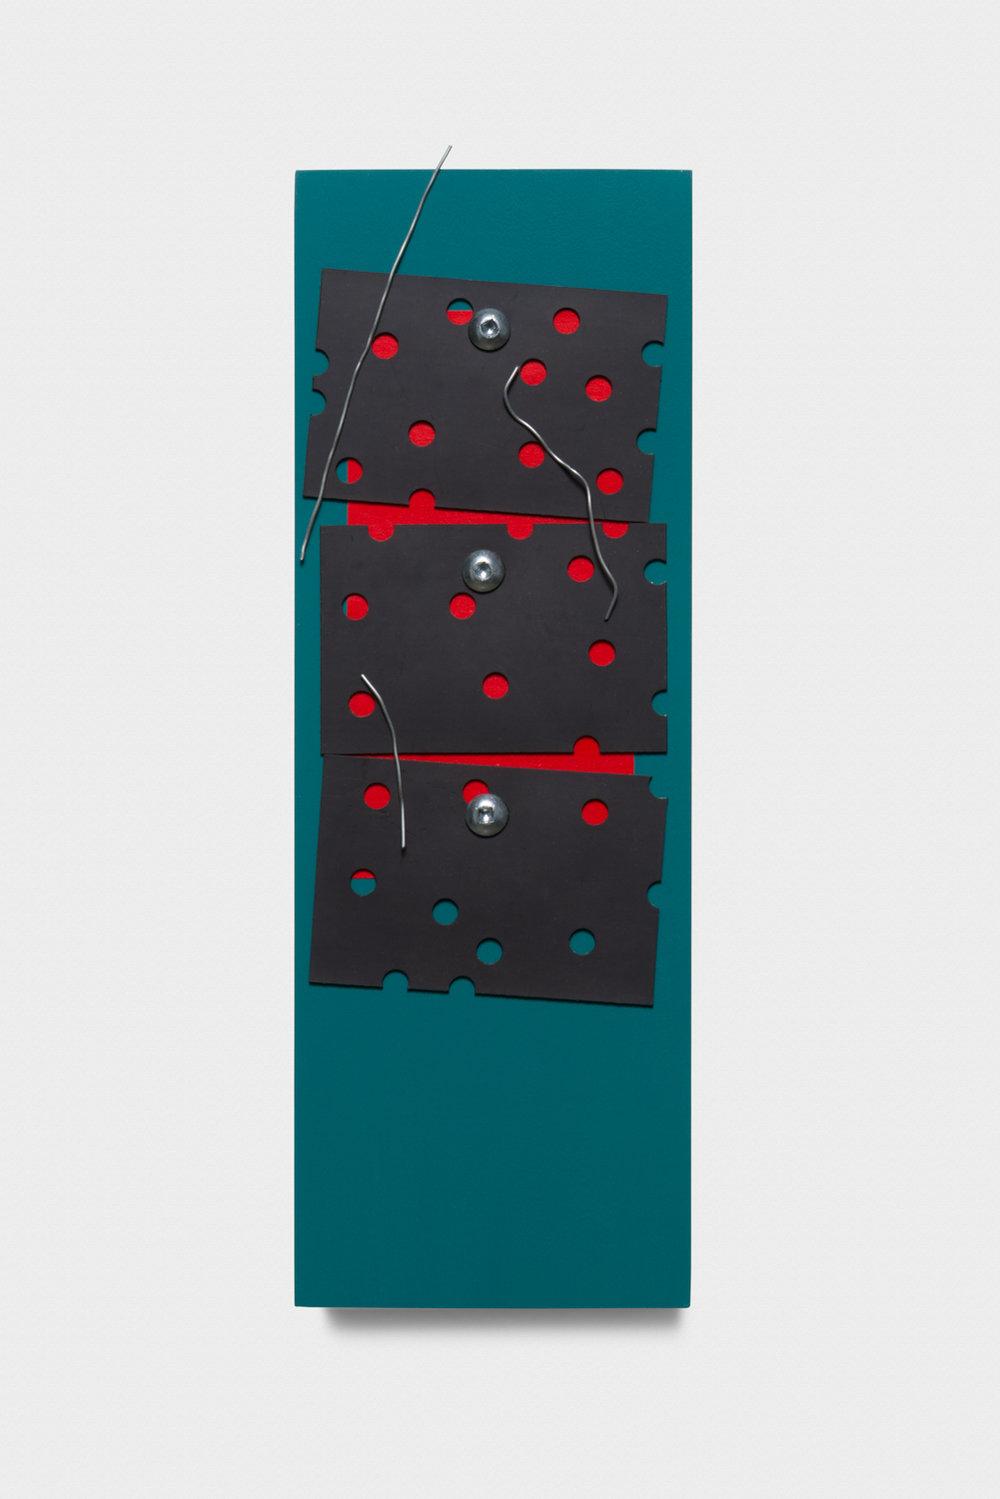 Vanessa Maltese  Chart no. 22  2014 Wood, paper, plexiglass, wire, hardware, acrylic, chalkboard paint 10h x 3 ½w x ¾d in VM003